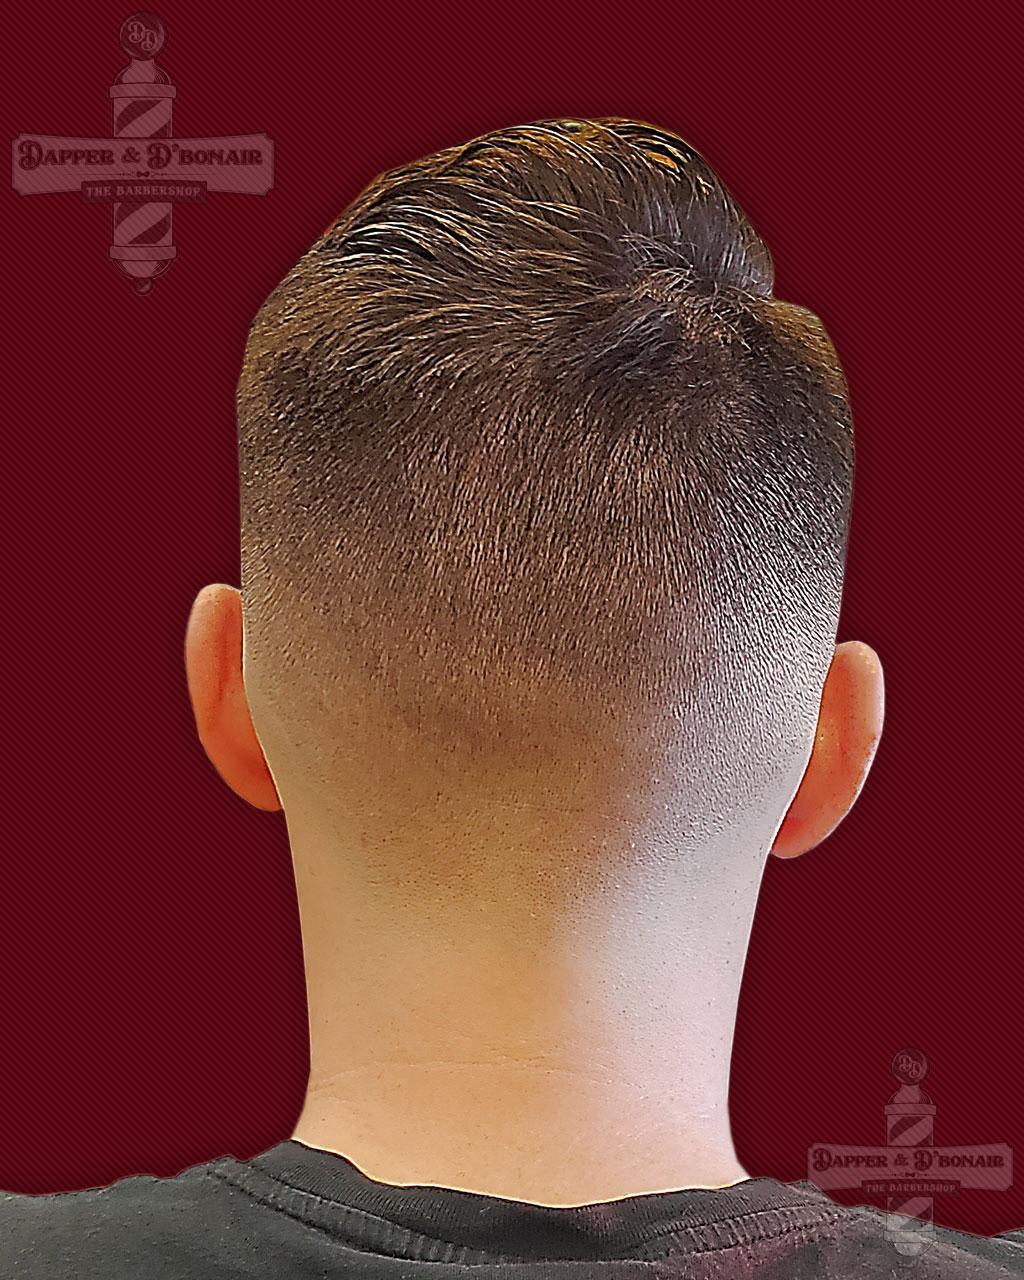 Haircut Gallery Dapper D Bonair The Barbershop Gallery